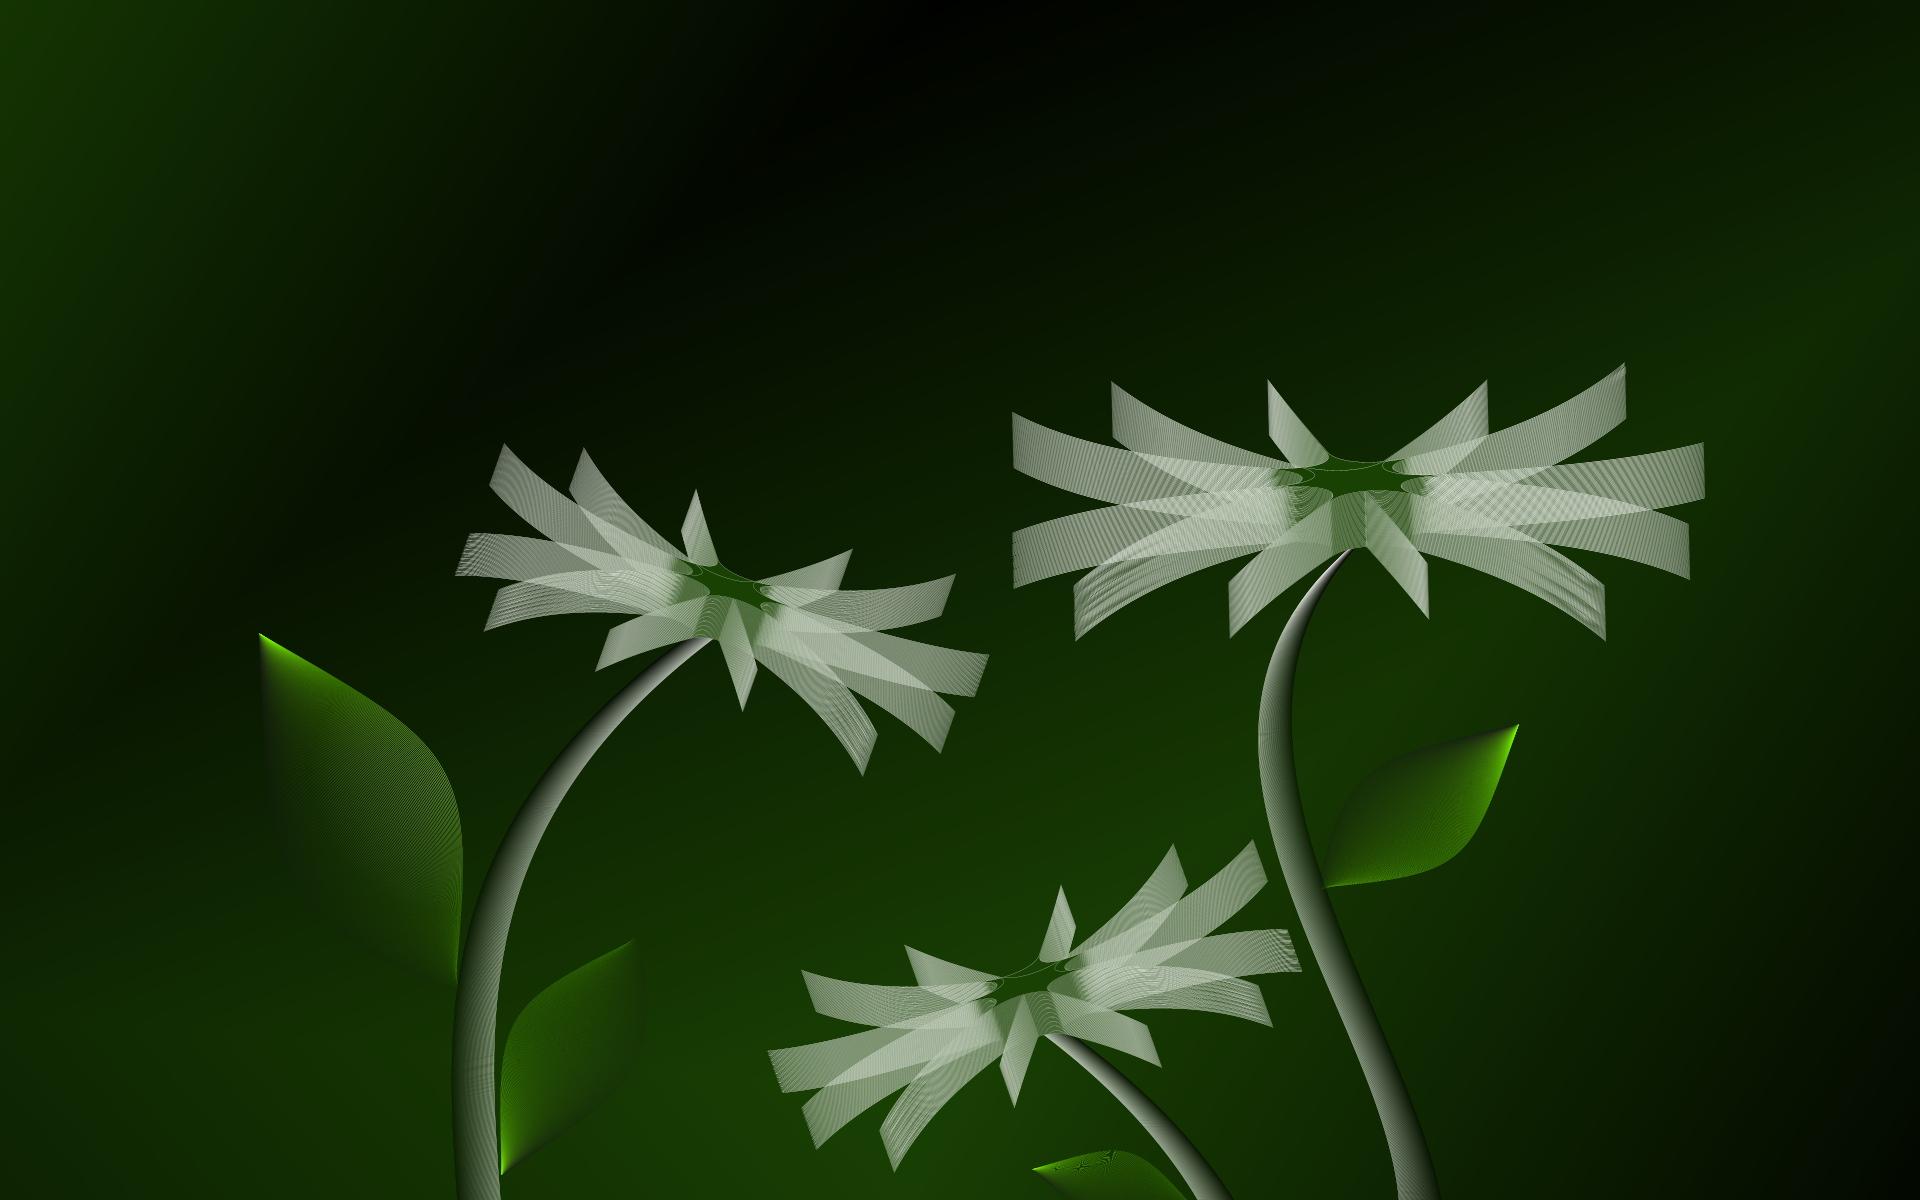 Flower Wallpaper 3D 19 Background